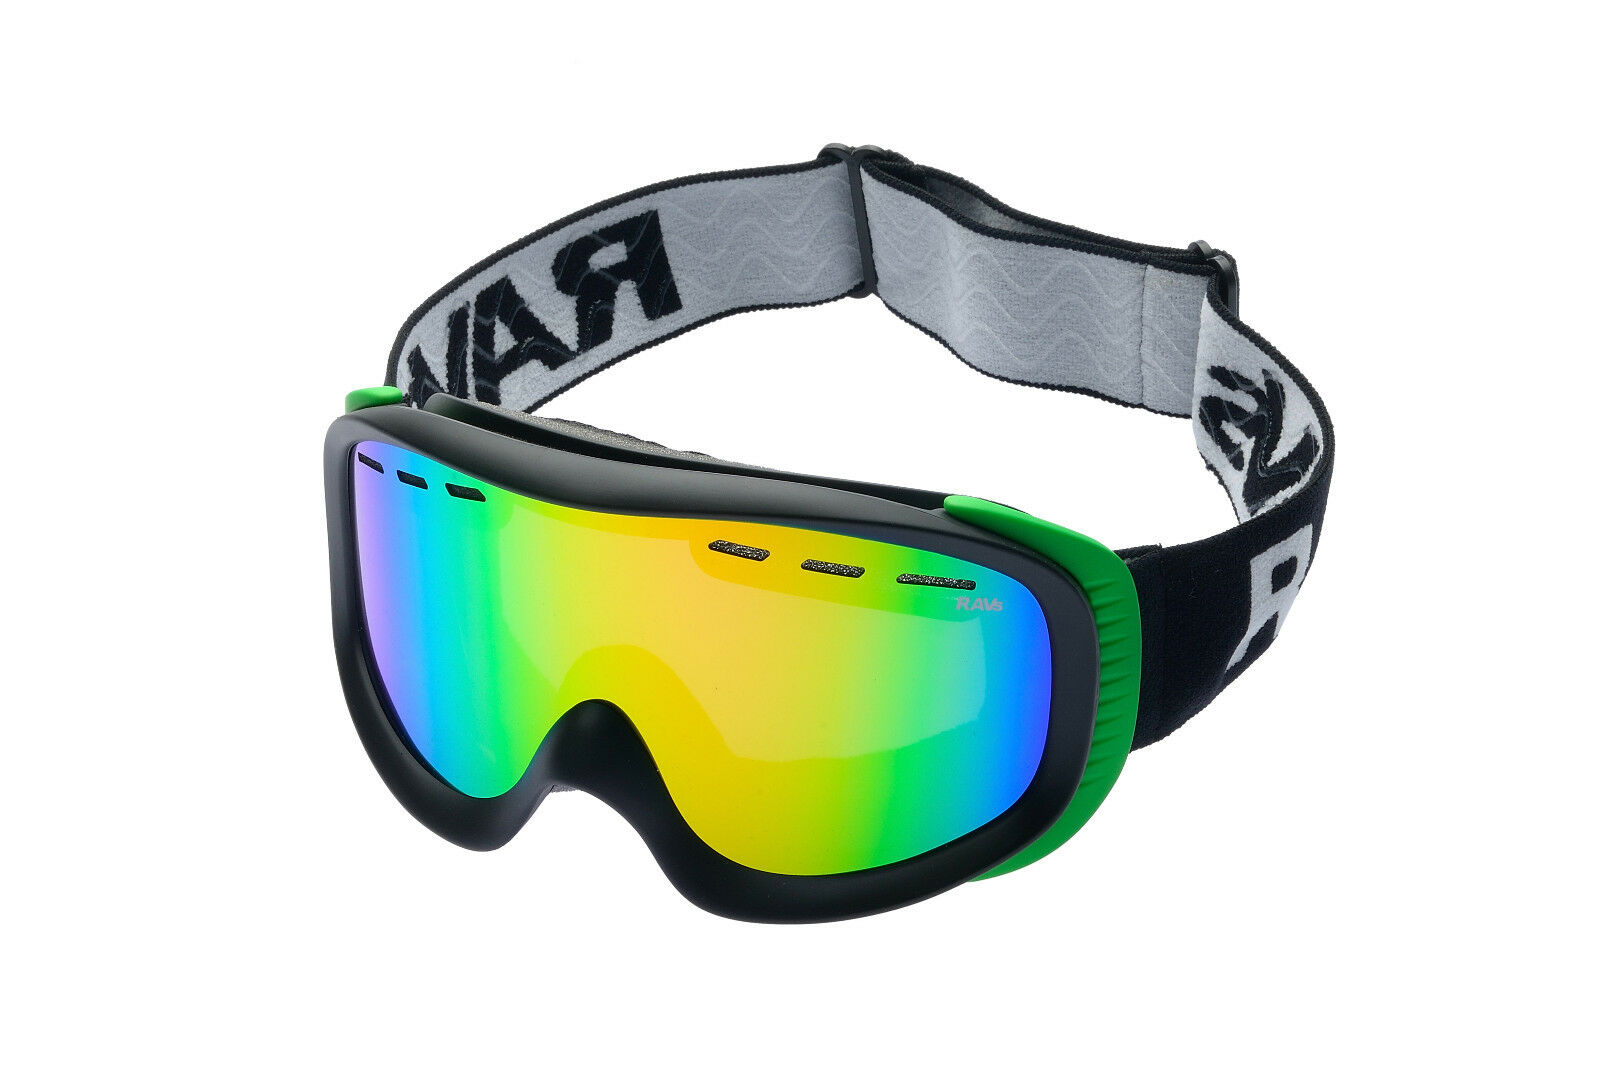 Ravs Ski Goggles Snowboard Alpine Predective - Contrast Enhanced